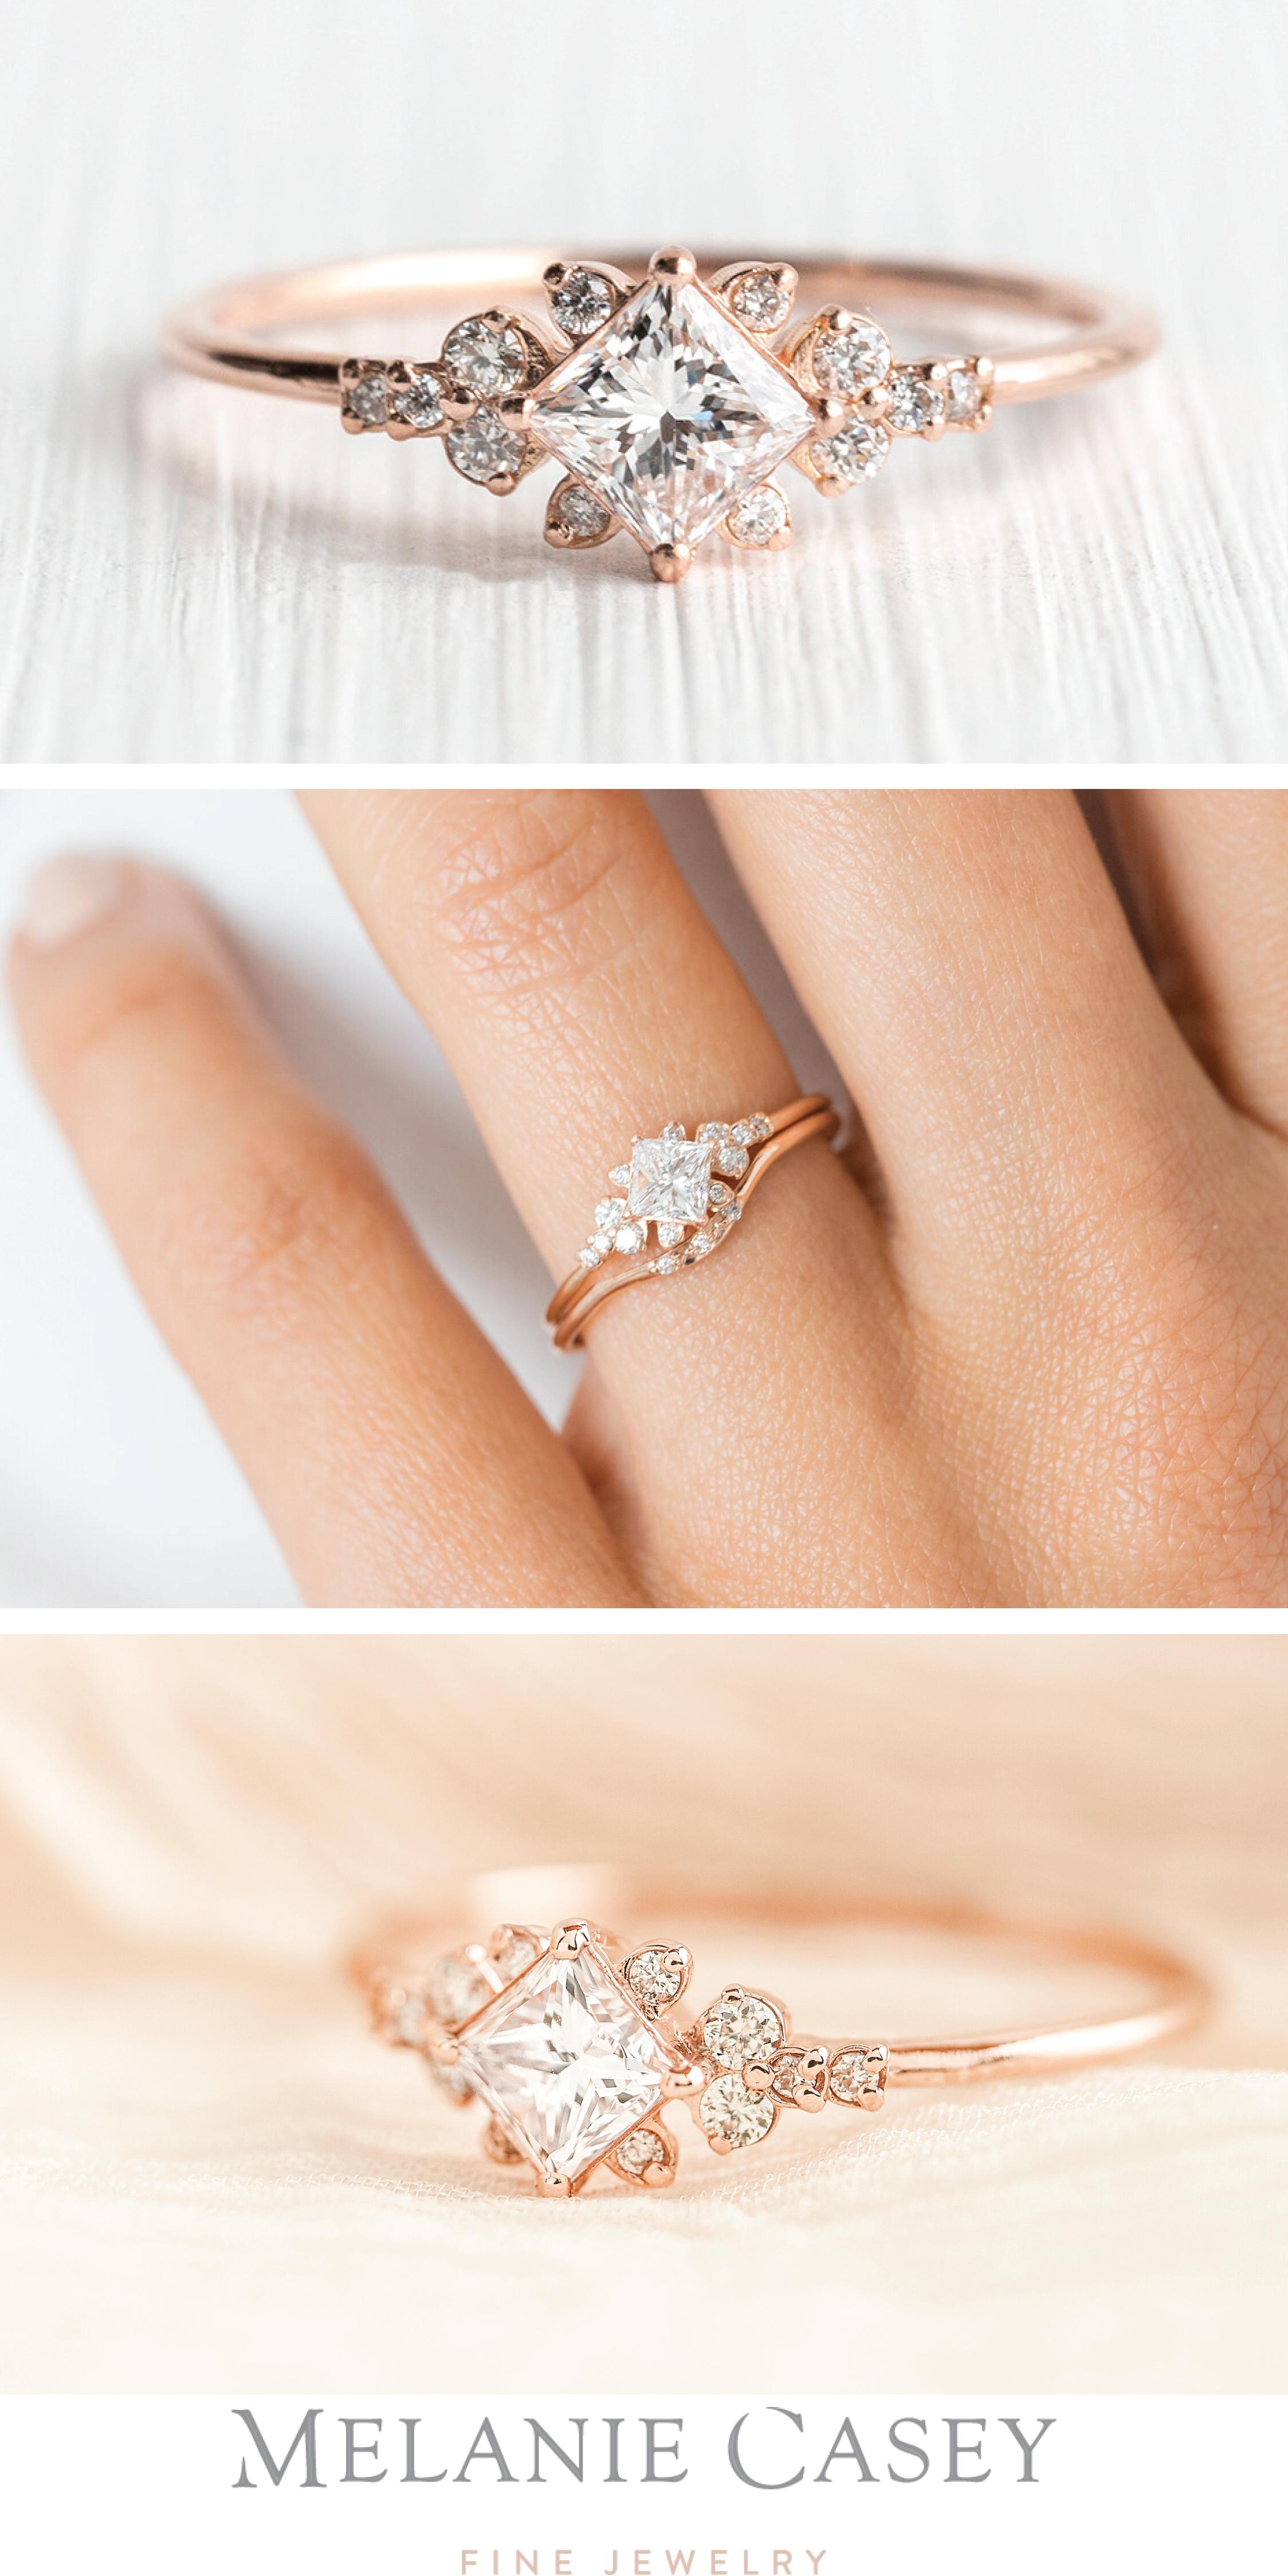 Stargaze Ring, 0.3ct. Princess Cut Diamond